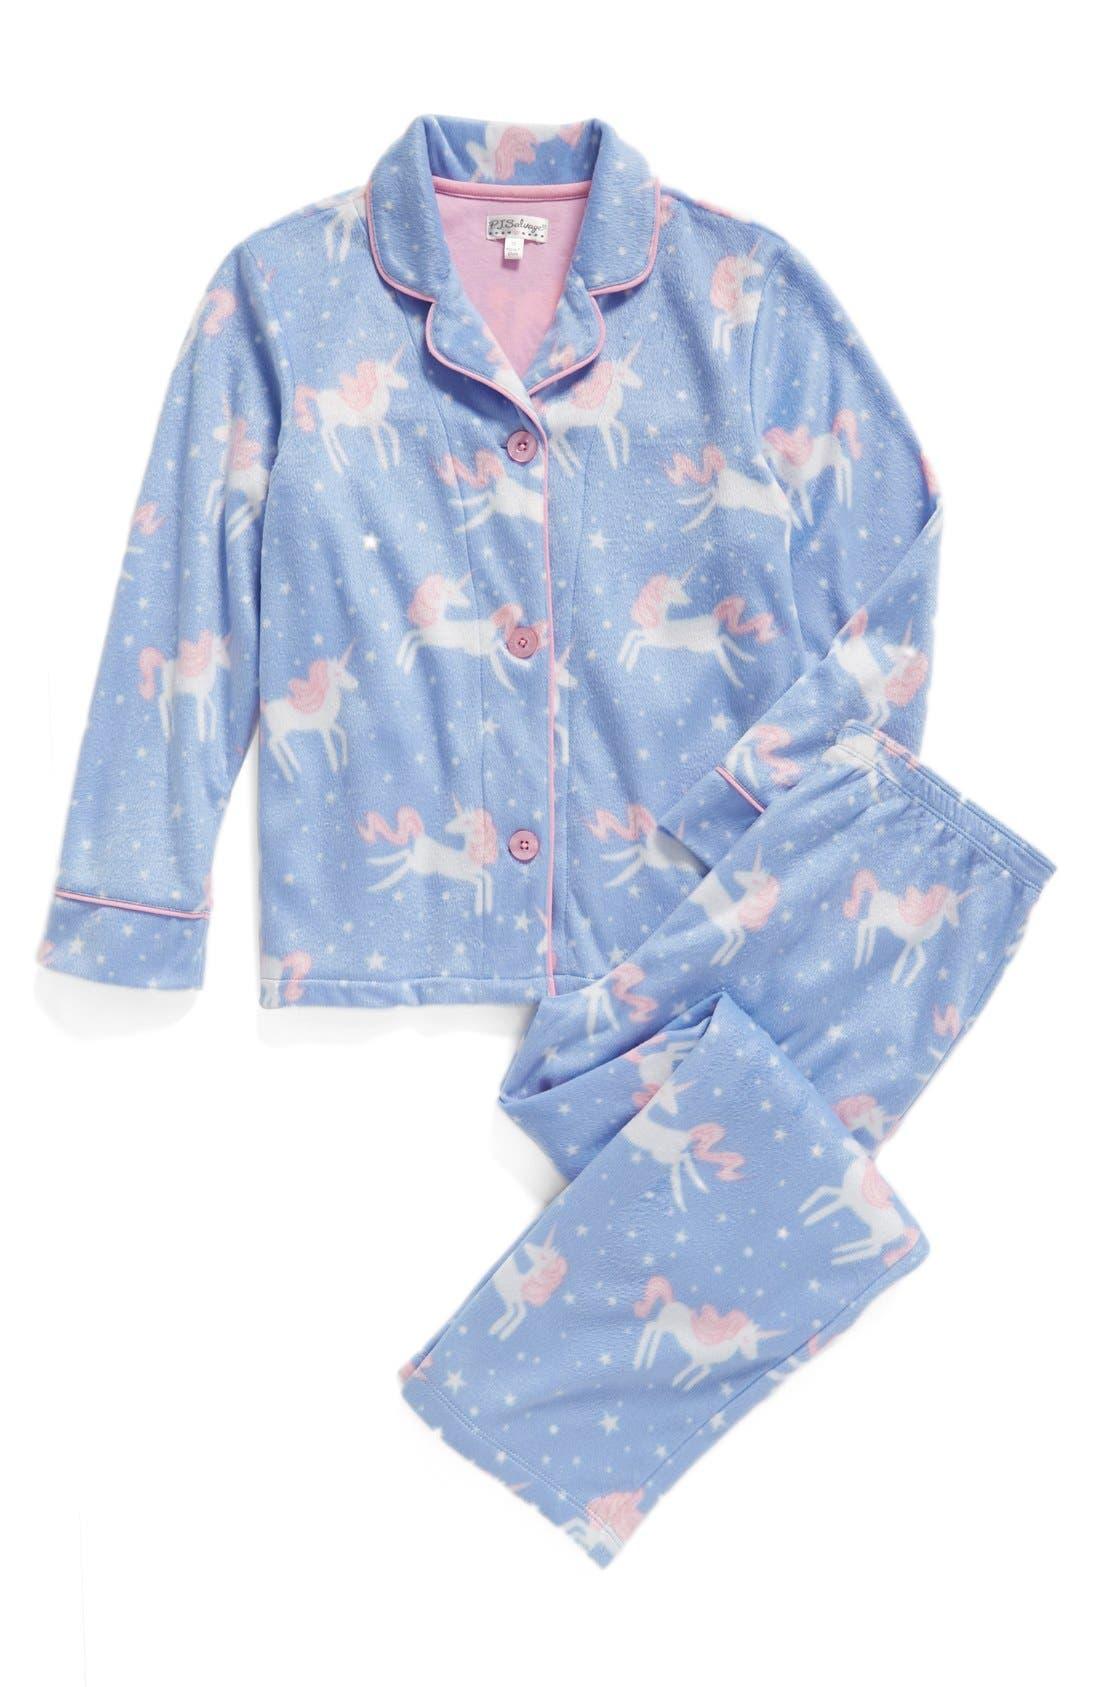 Alternate Image 1 Selected - PJ Salvage Unicorn Two-Piece Pajamas (Little Girls & Big Girls)